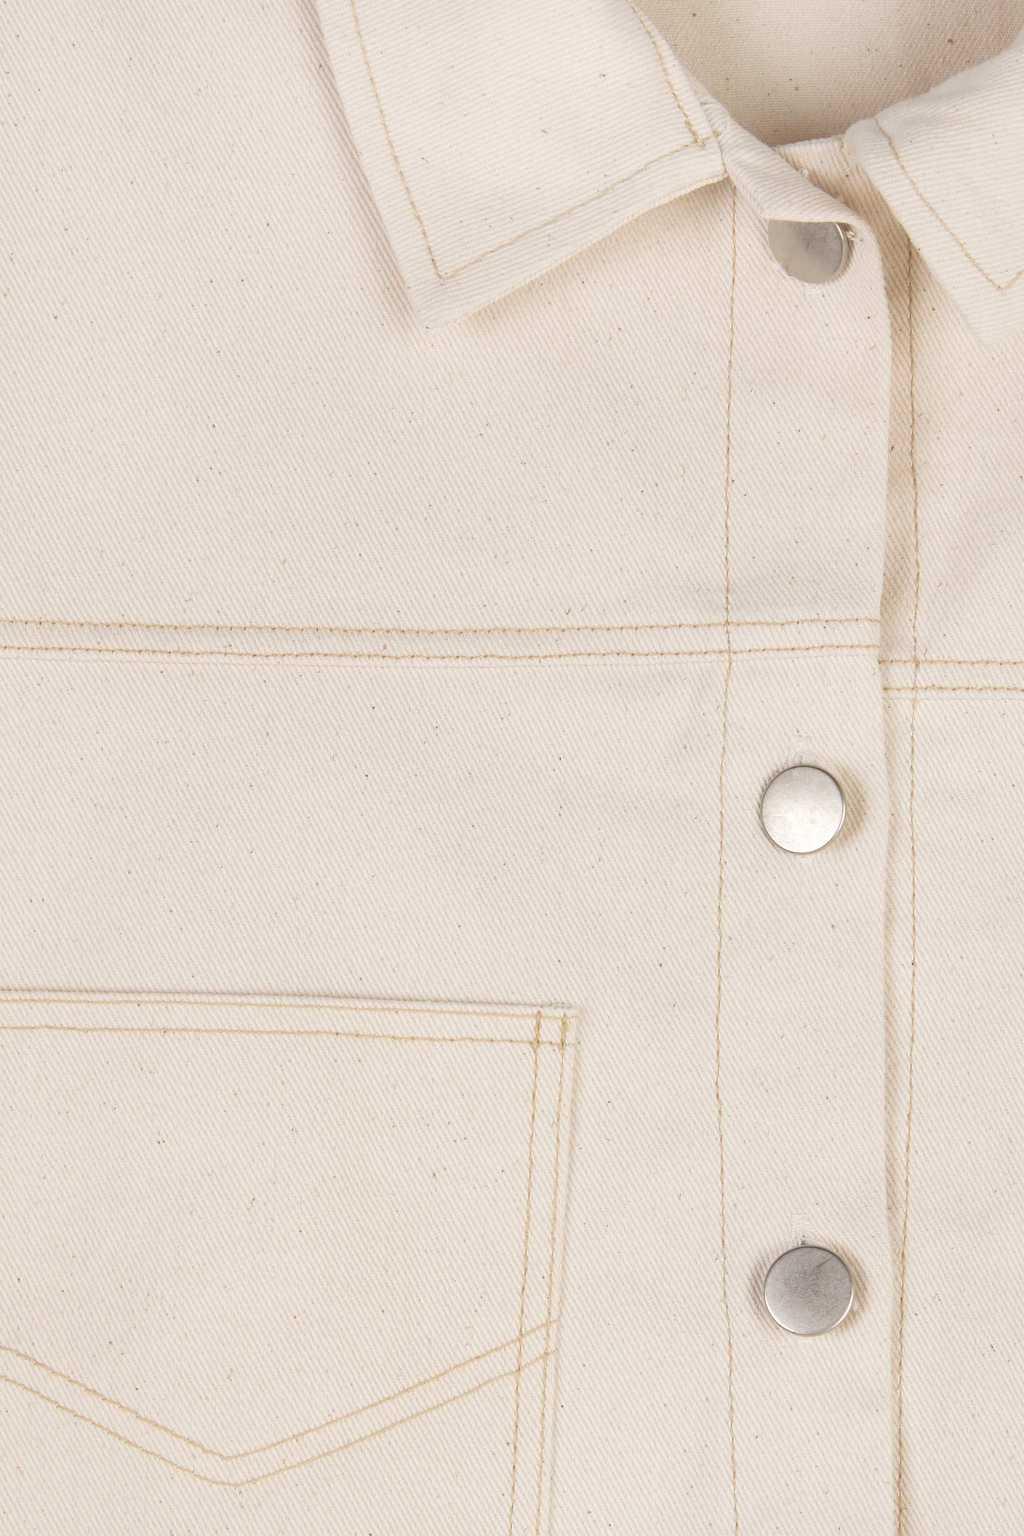 Jacket J011 Cream 6